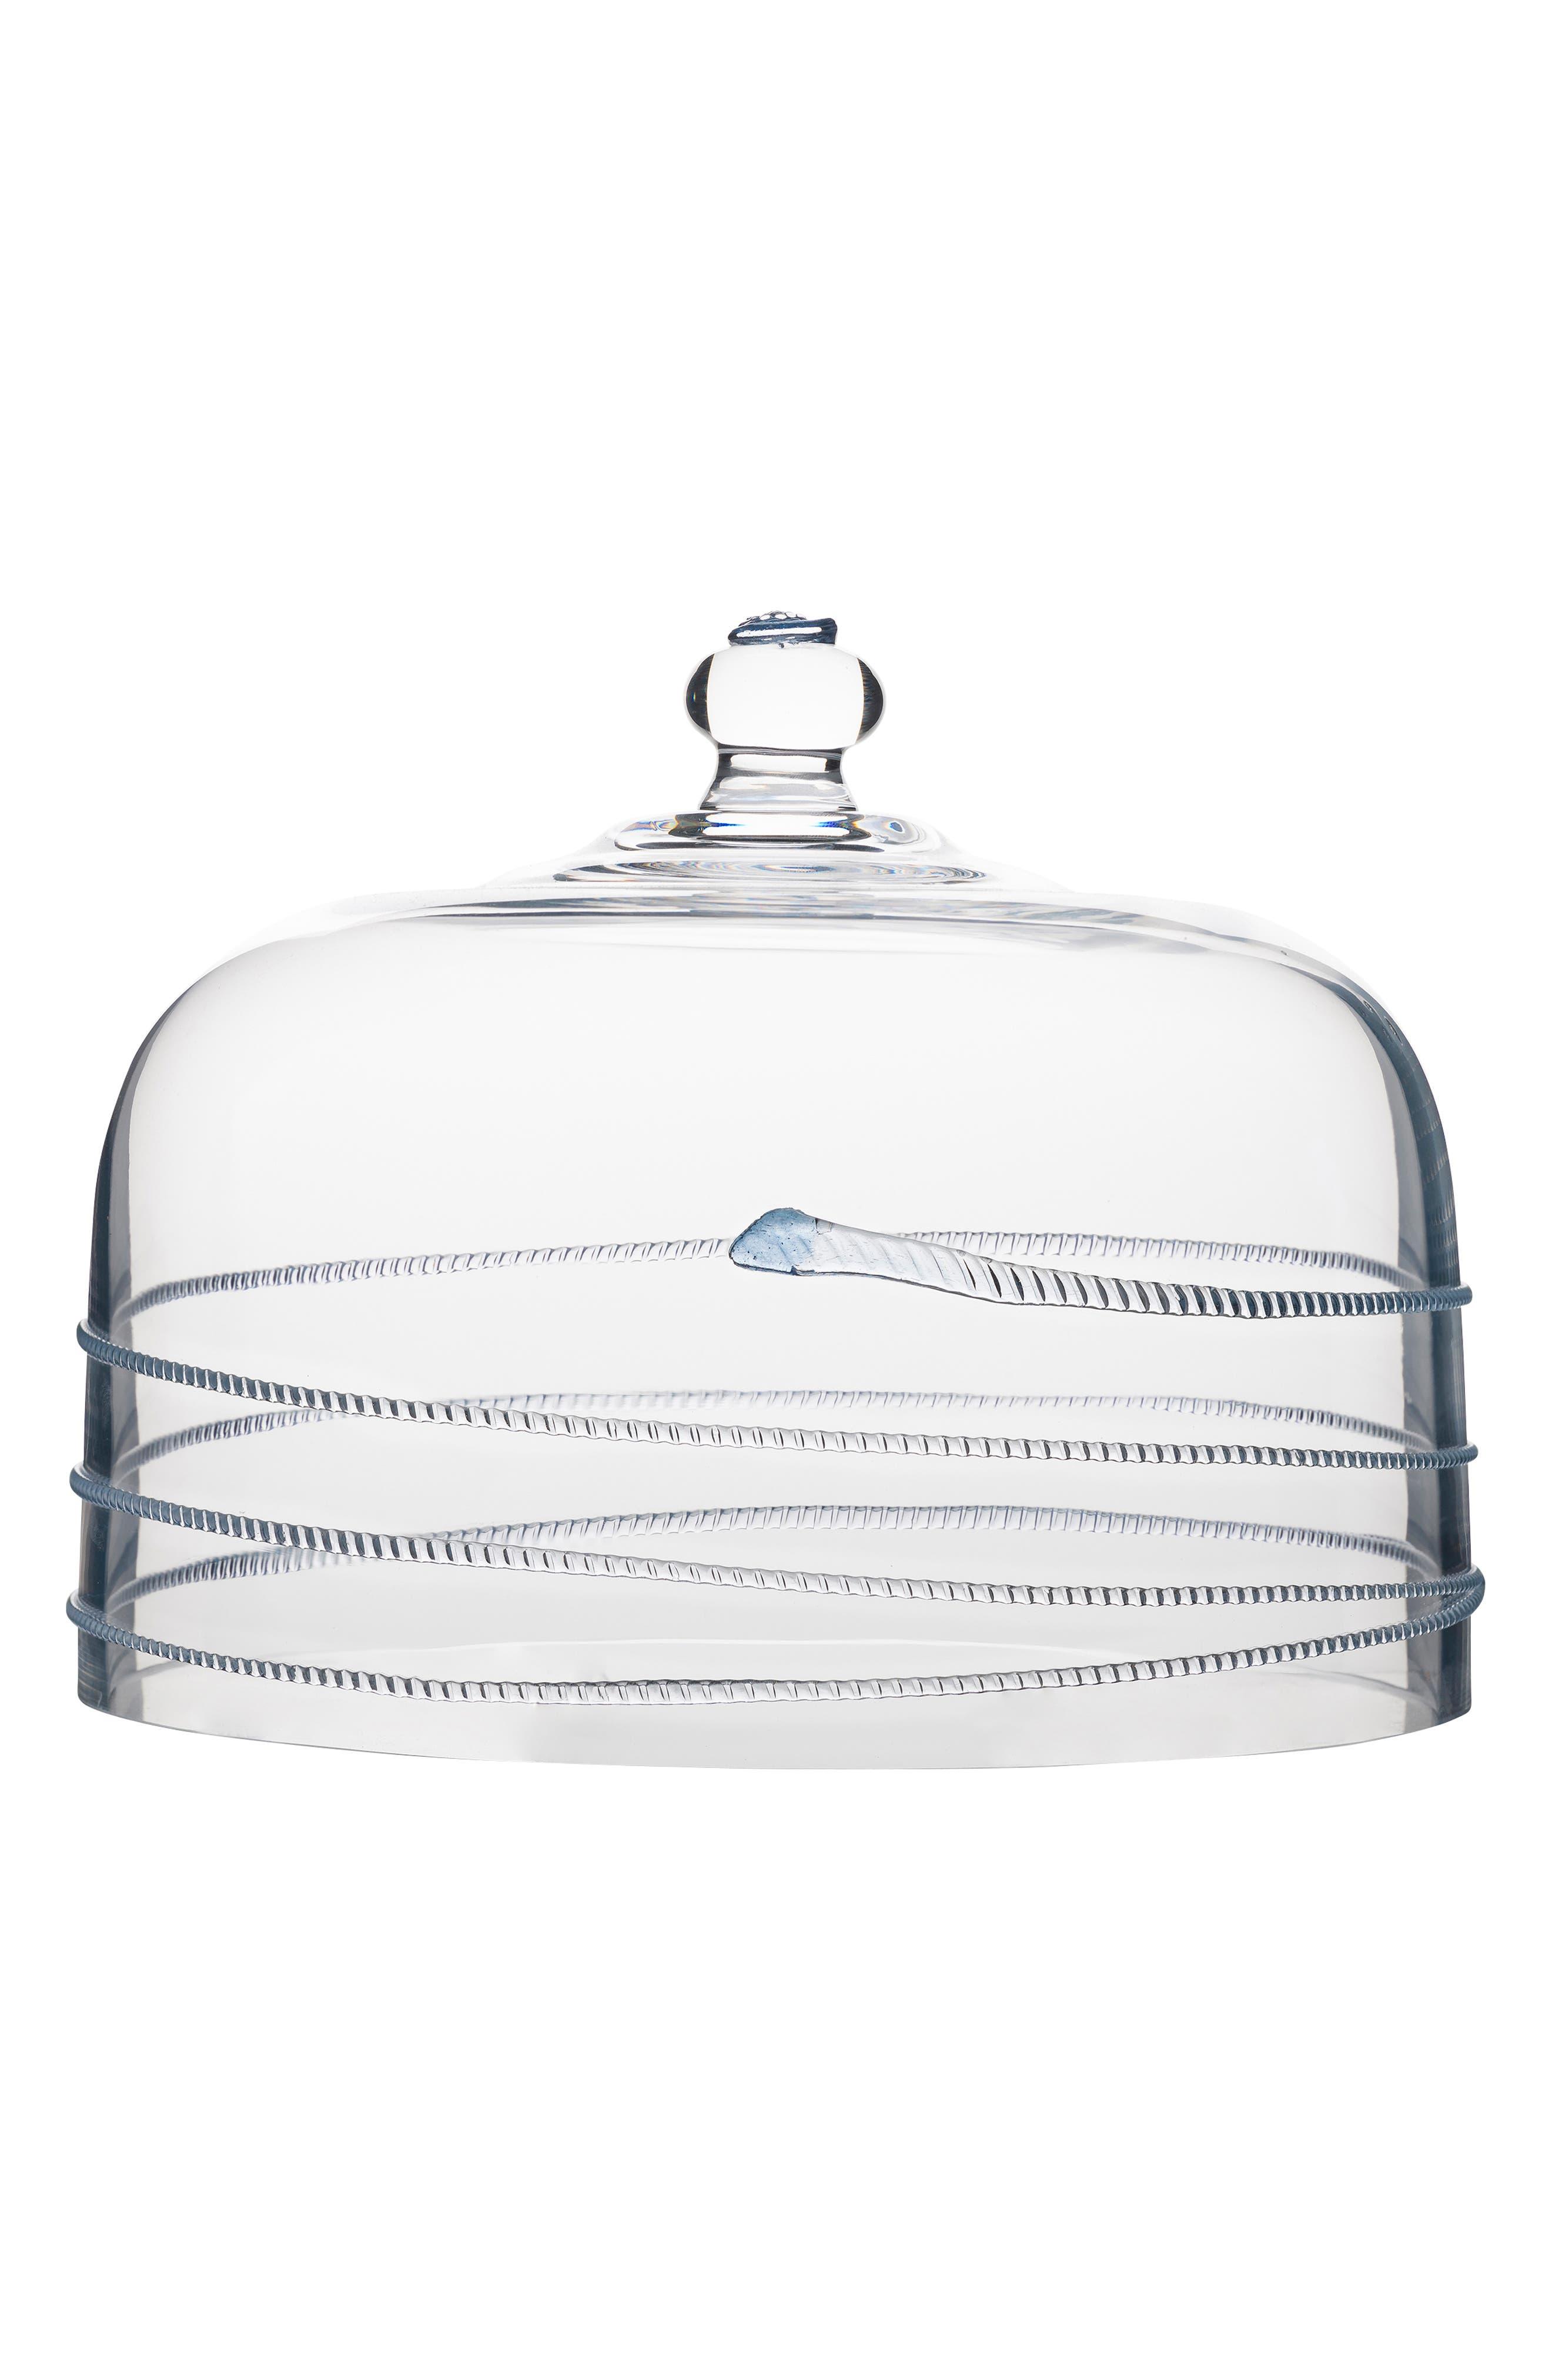 JULISKA,                             Amalia Glass Cake Dome,                             Main thumbnail 1, color,                             CLEAR